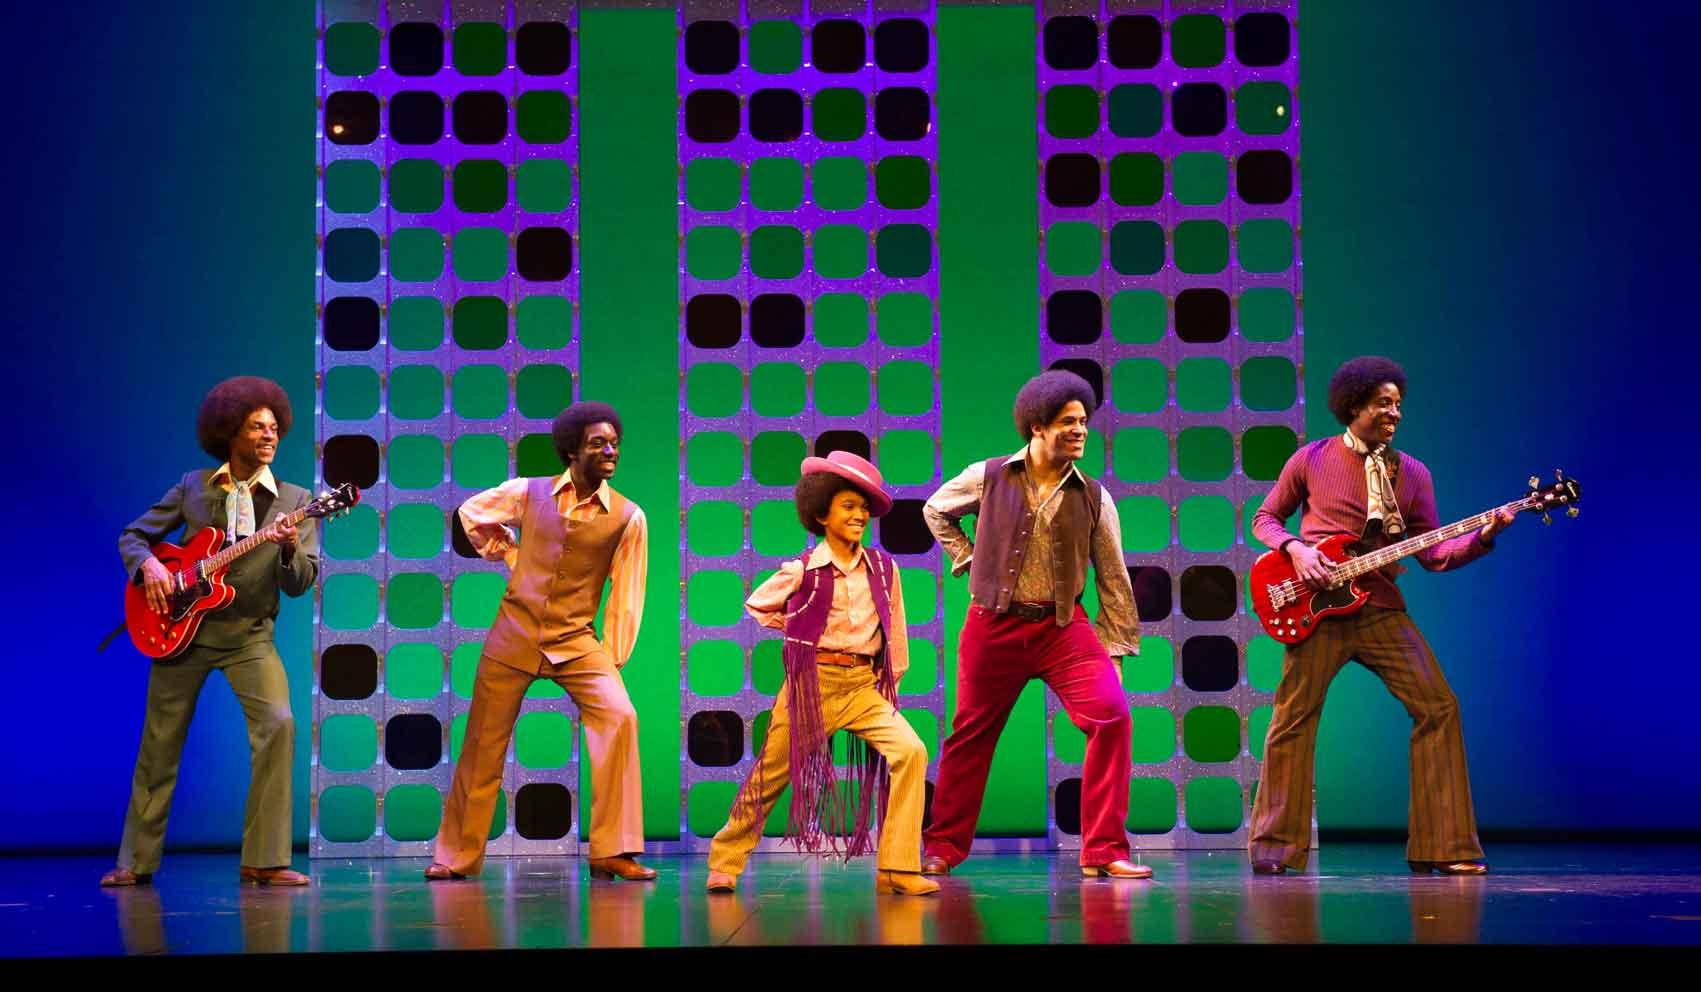 l-r Brandon Lee Sears, Samuel Edwards, Eshan Gopal, Simon Ray Harvey, Simeon Montague as The Jackson 5 in Motown the Musical.  Photo : Alastair Muir | First Look: Motown the Musical